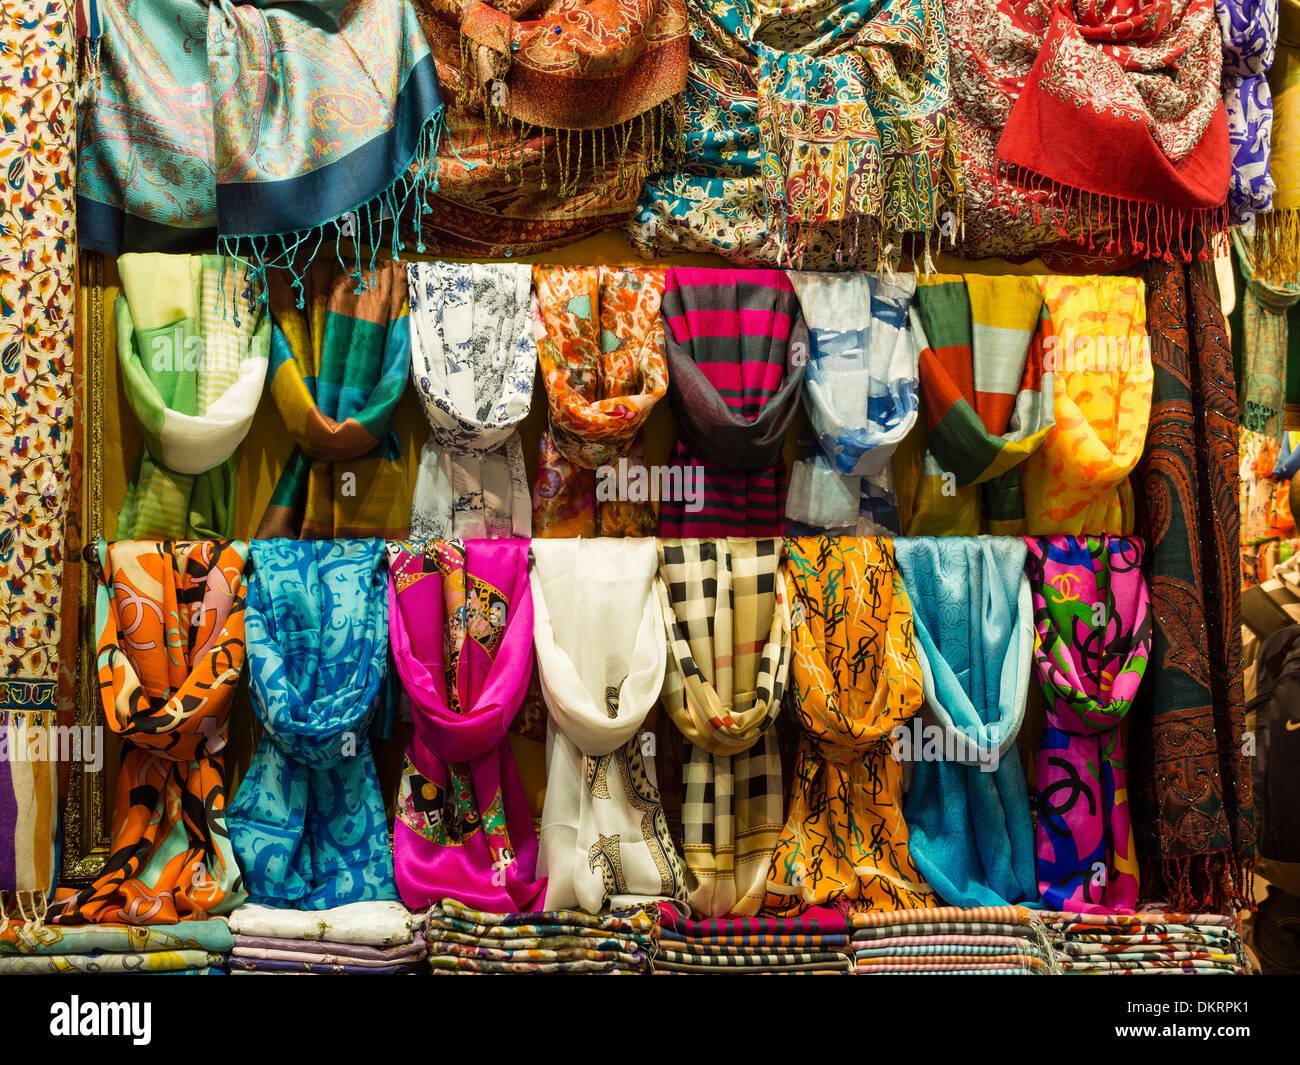 Shawl display in the Grand Bazaar Istanbul Turkey. - Stock Image